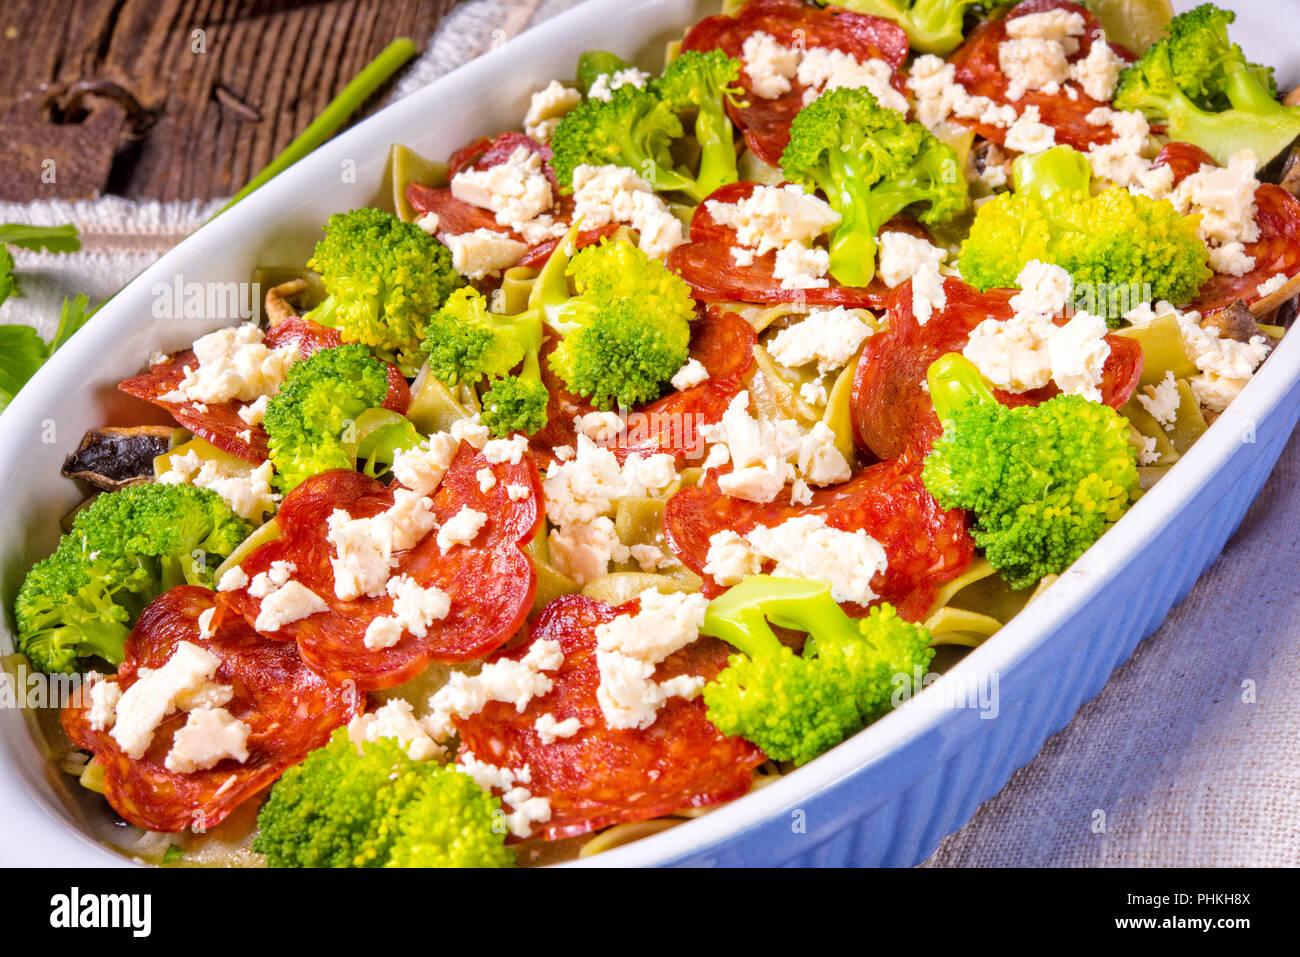 Pasta casserole with chorizo sausage and broccoli - Stock Image